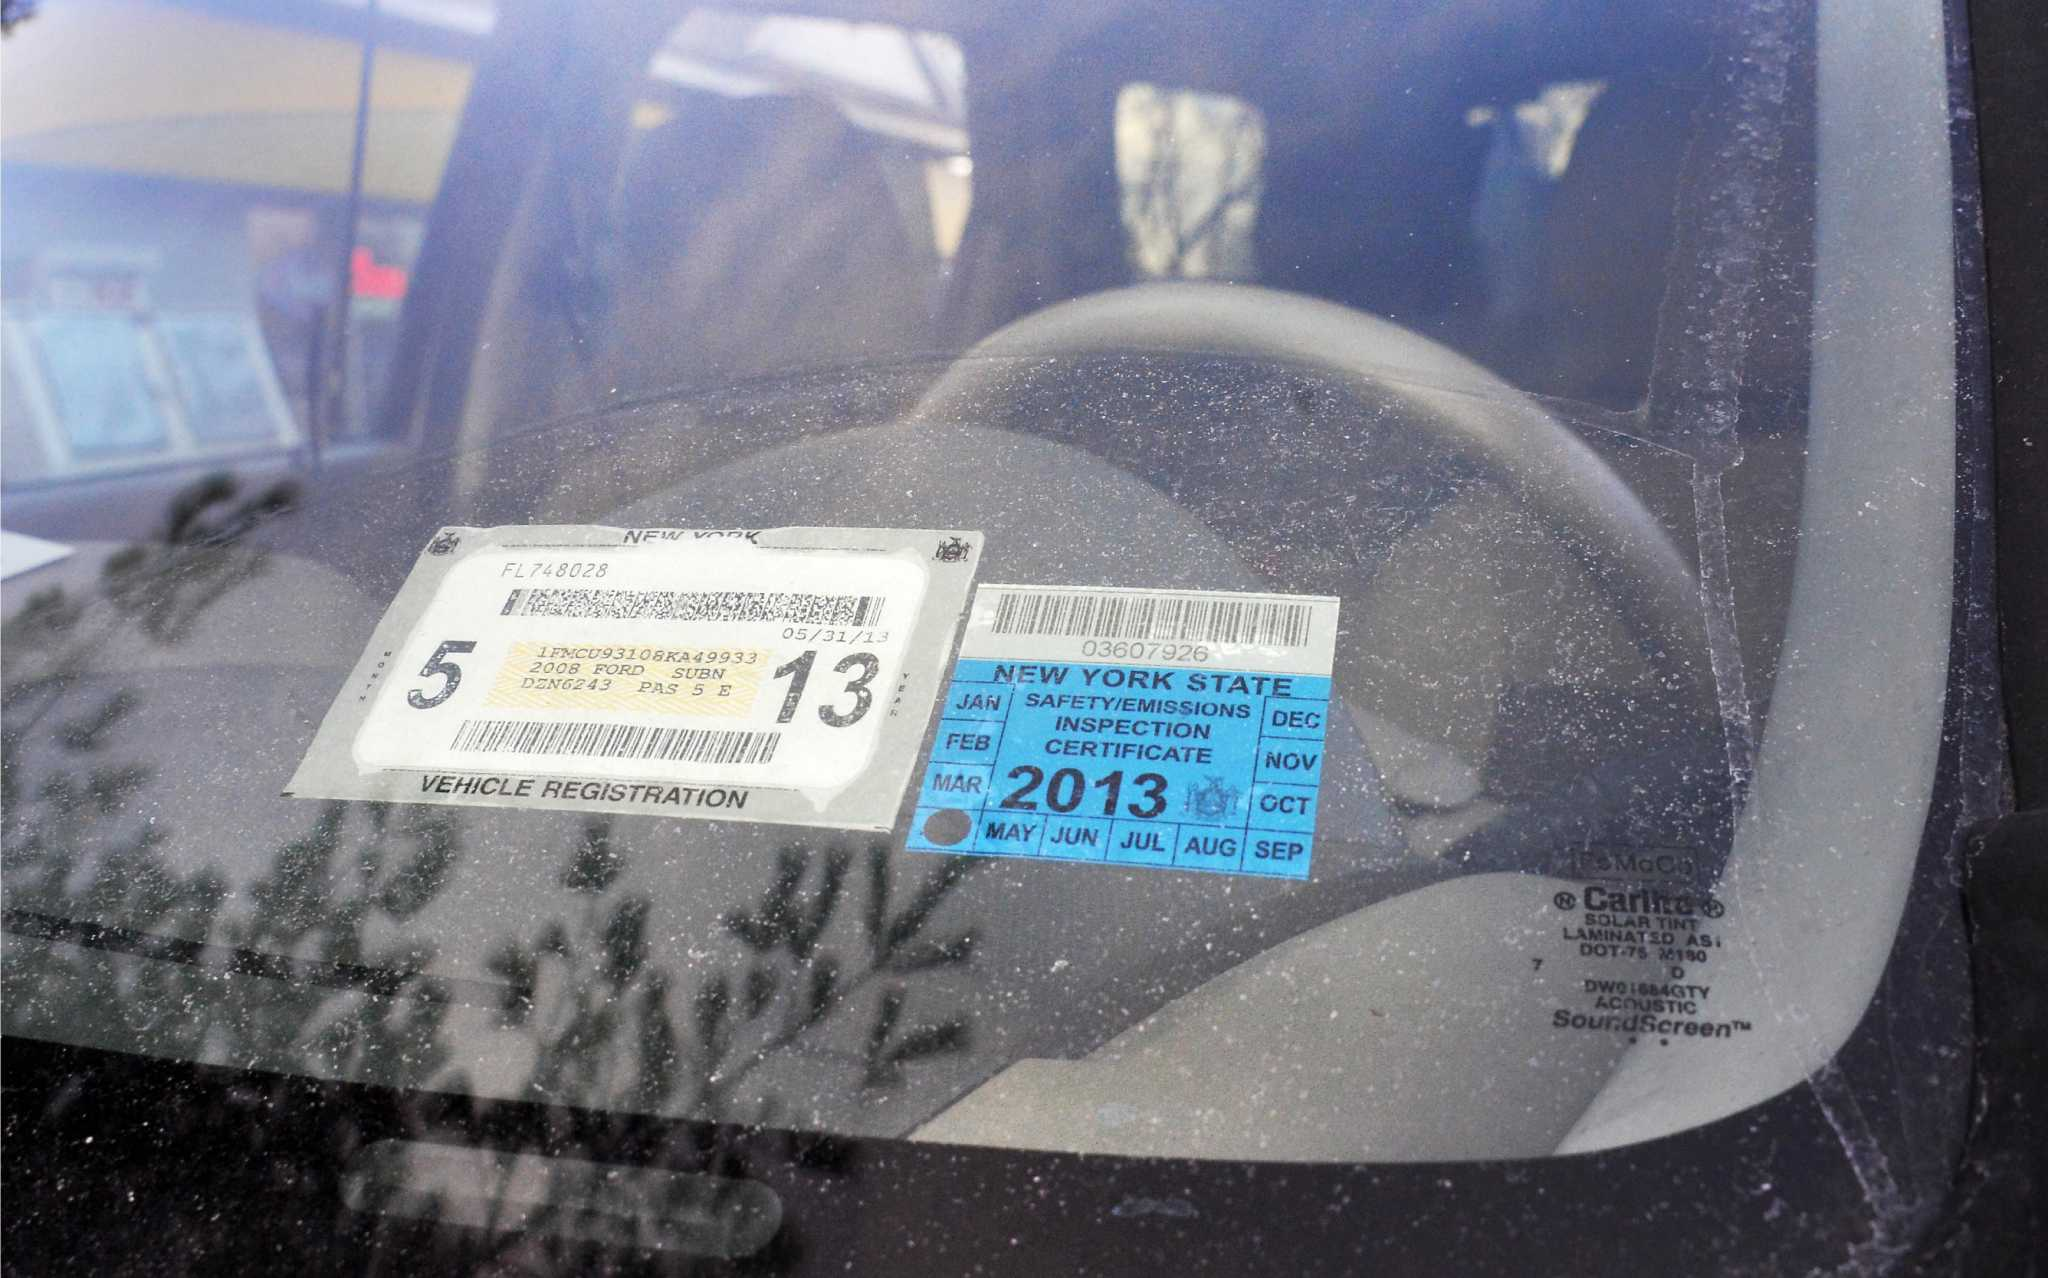 Flaws Delay Dmv Registration Stickers Times Union